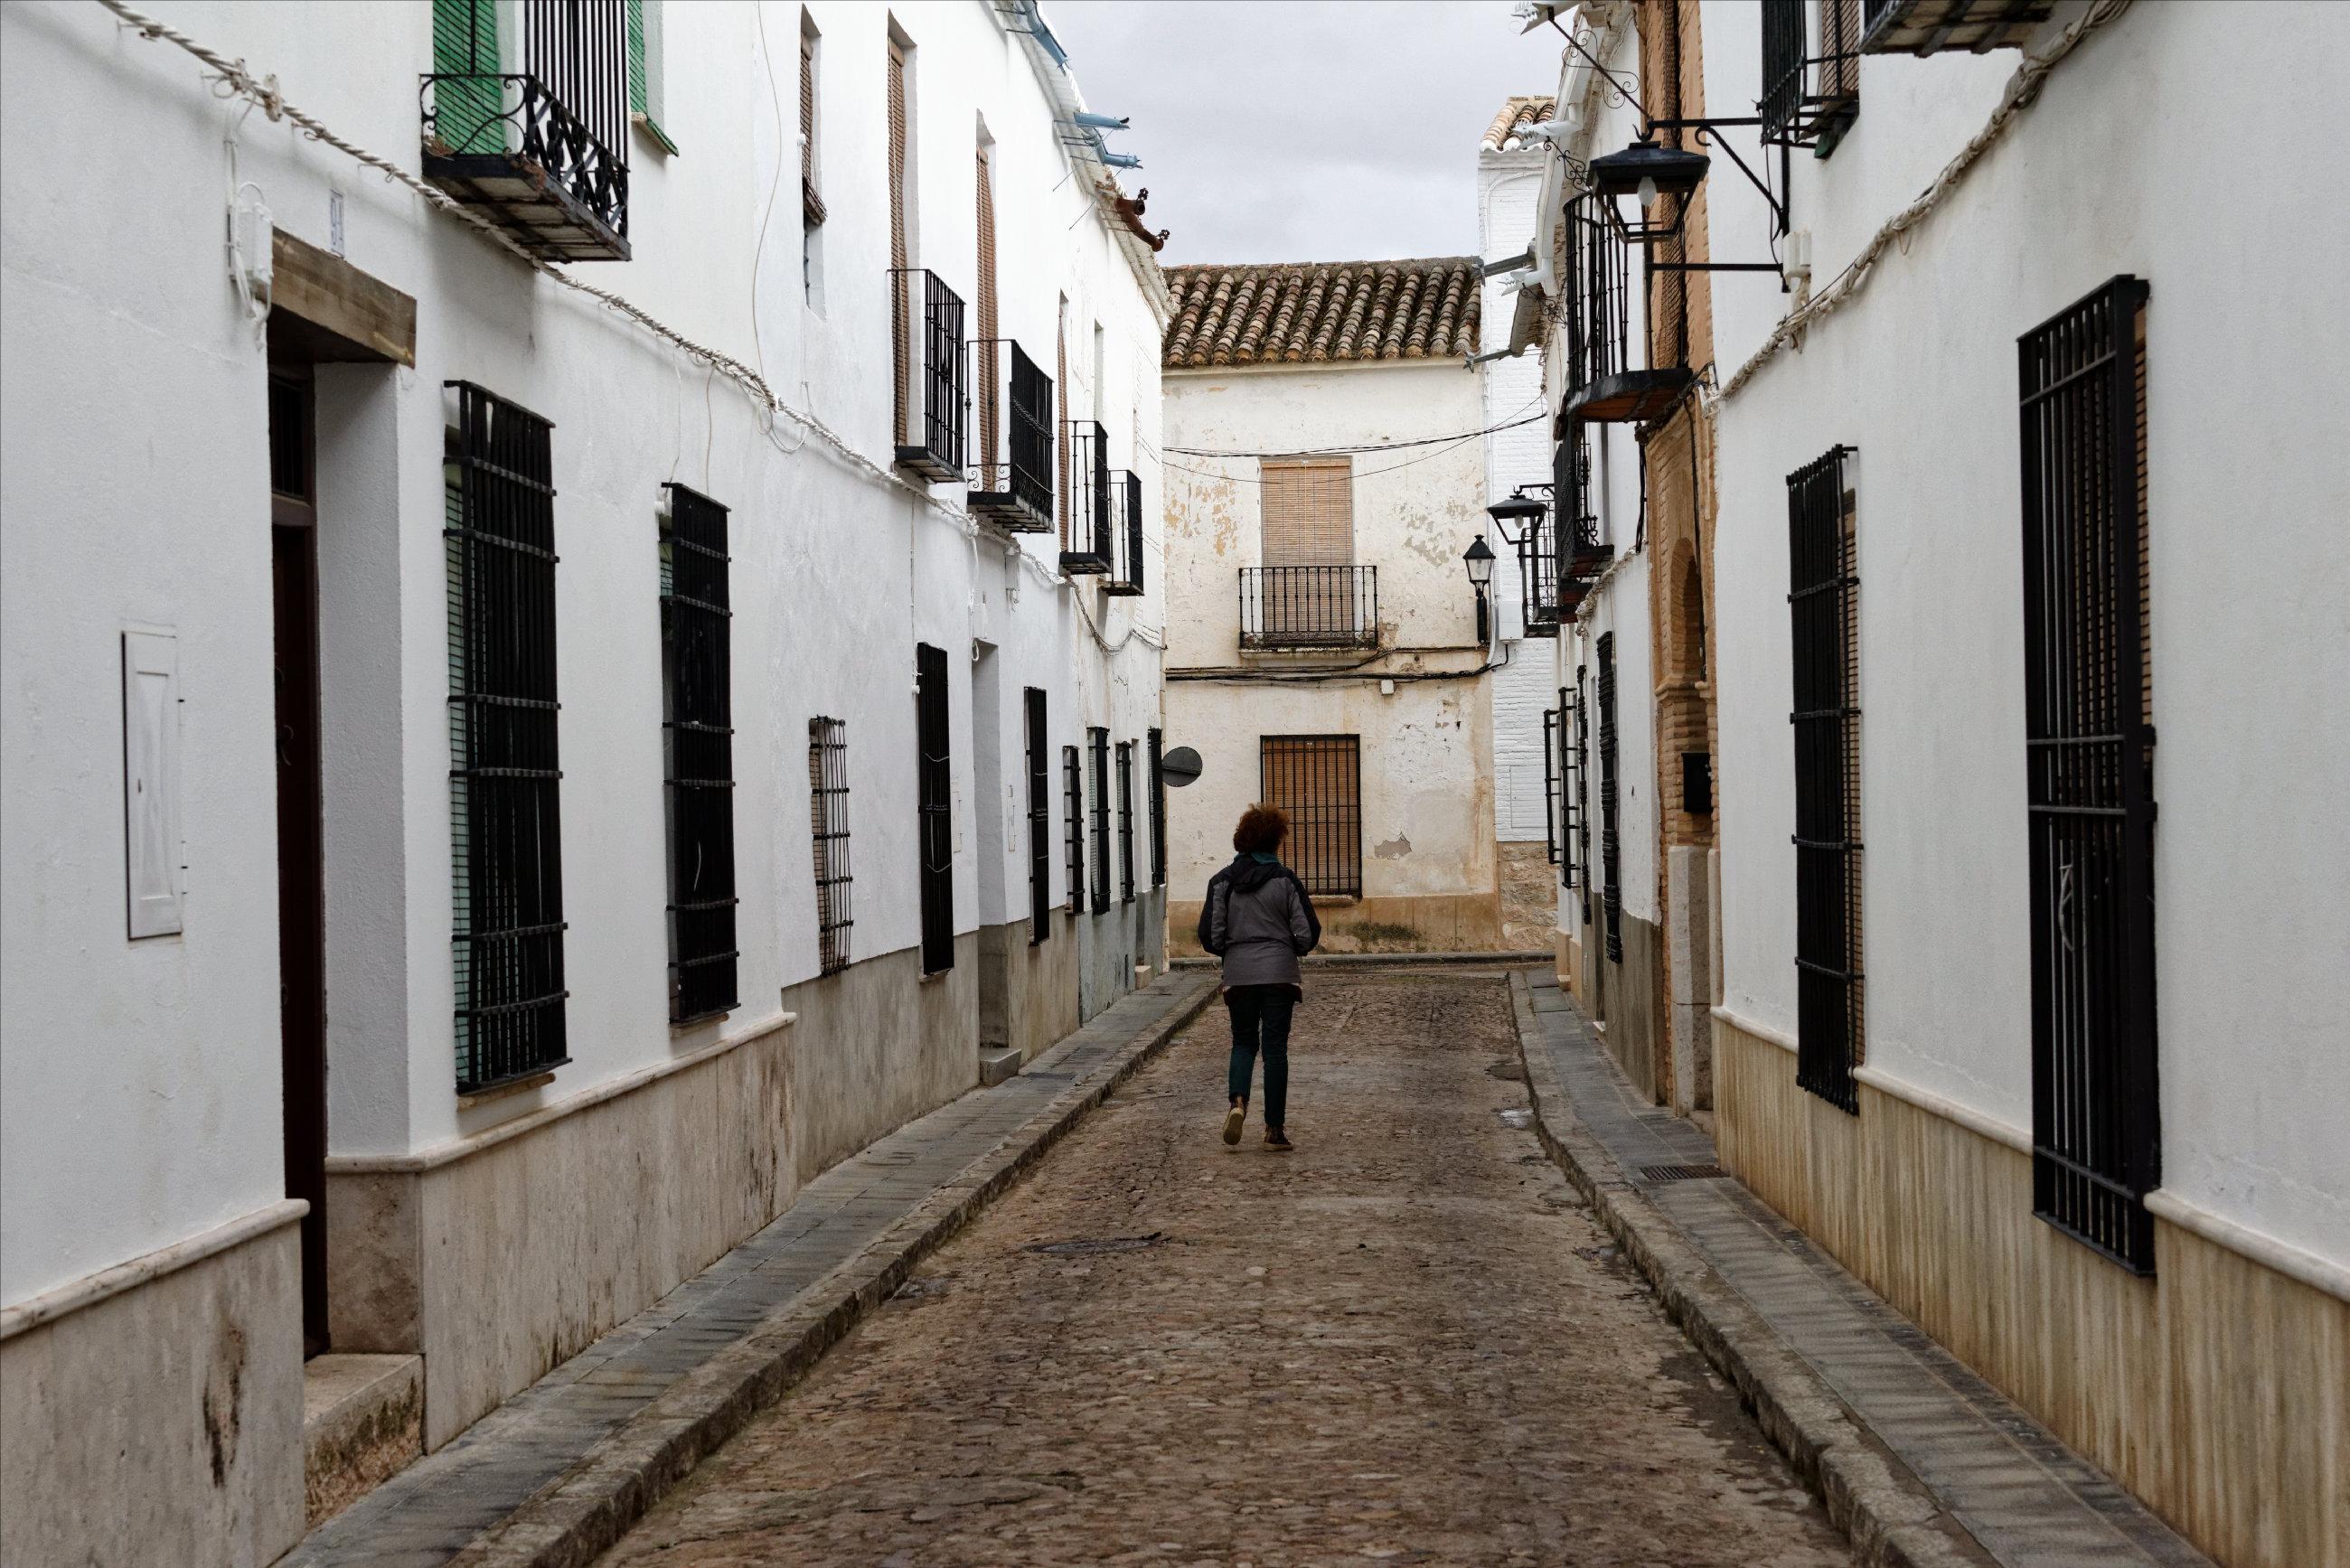 151102-Almagro (53)